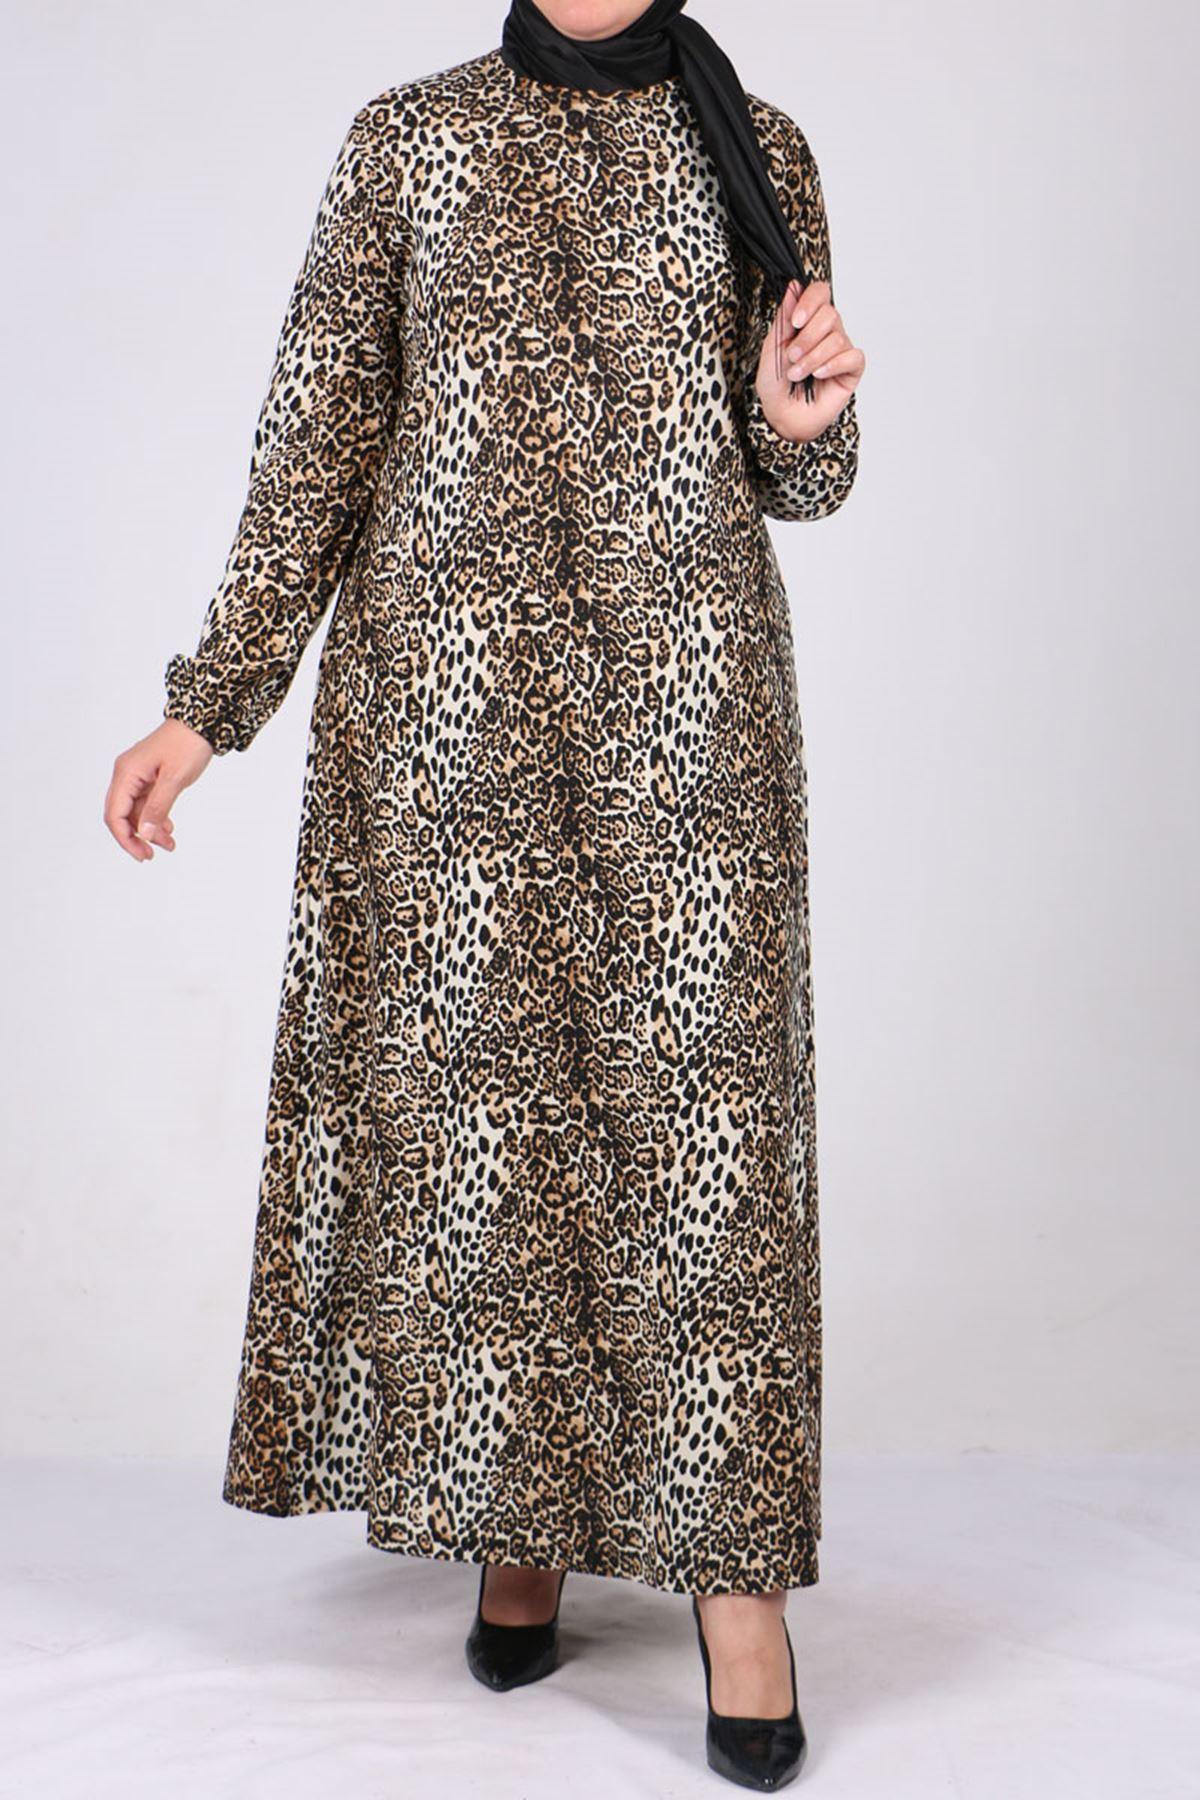 2093 Plus Size Knitted Crepe Sleeve Elastic Dress - Beige - Leopard